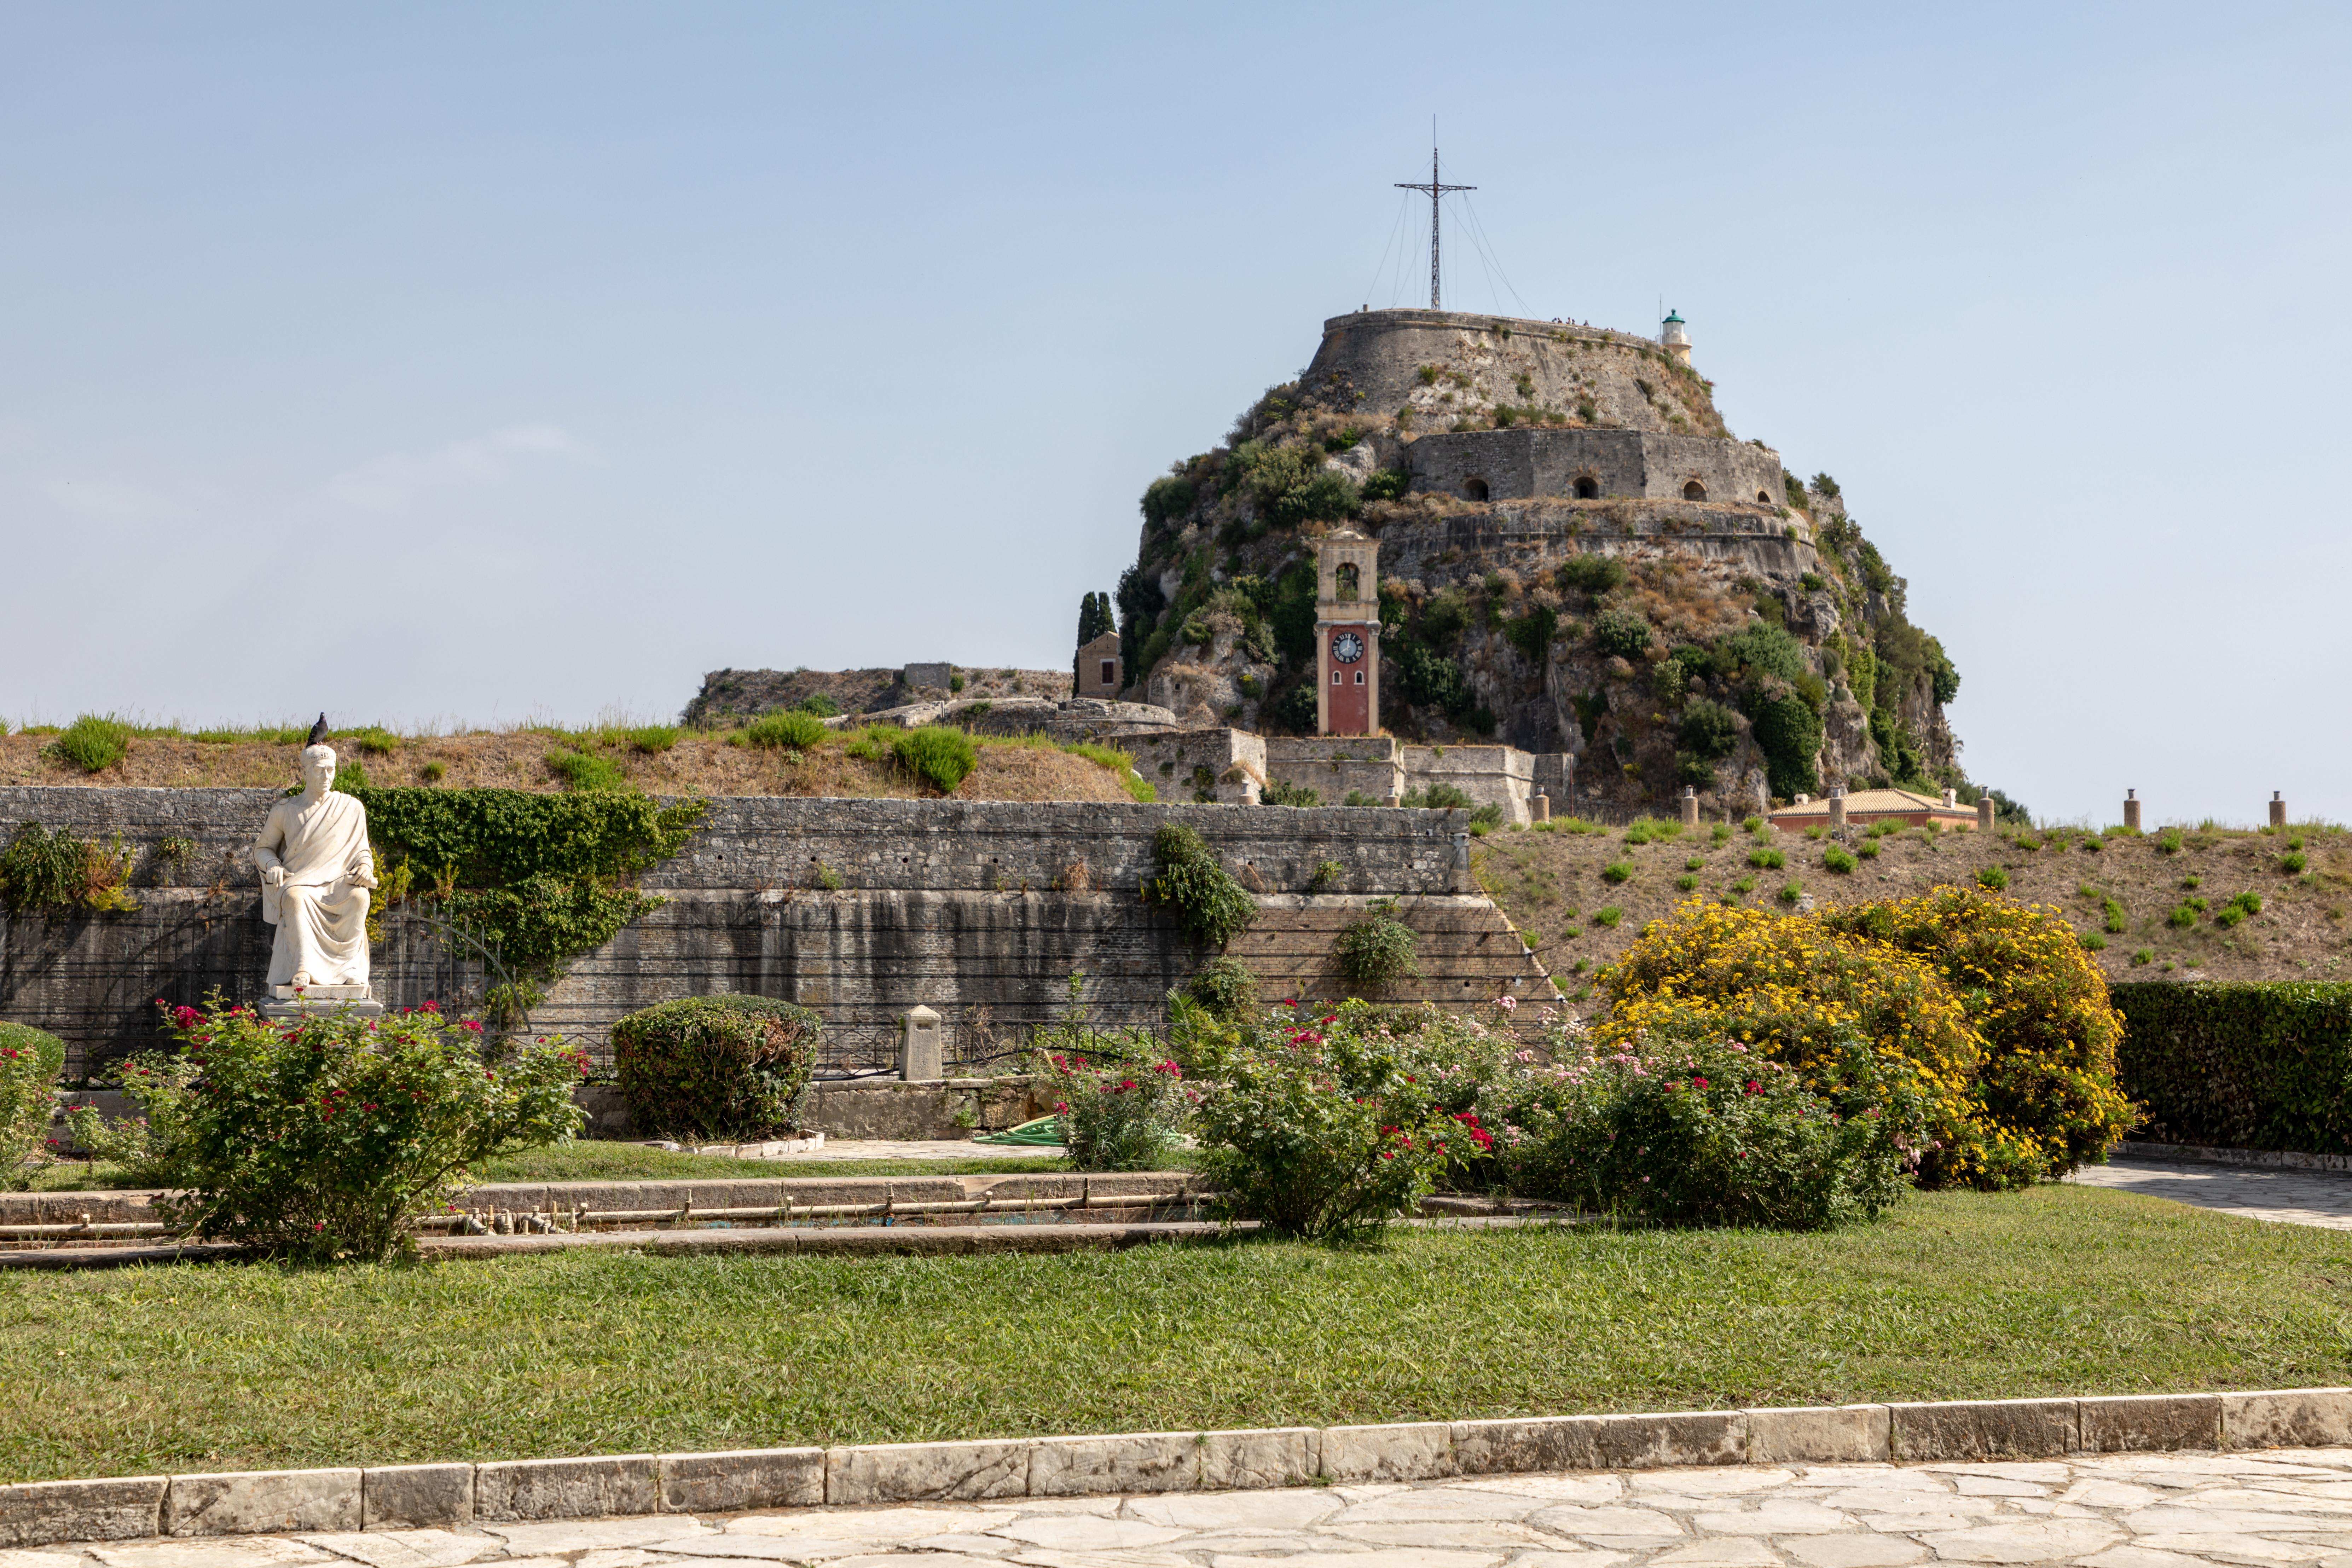 Frourio, Corfu, Greece (2018) German Alte Festung, Korfu, Griechenland (2018) object has role: photographer World Heritage Site ID: 978 refine date: 13:37